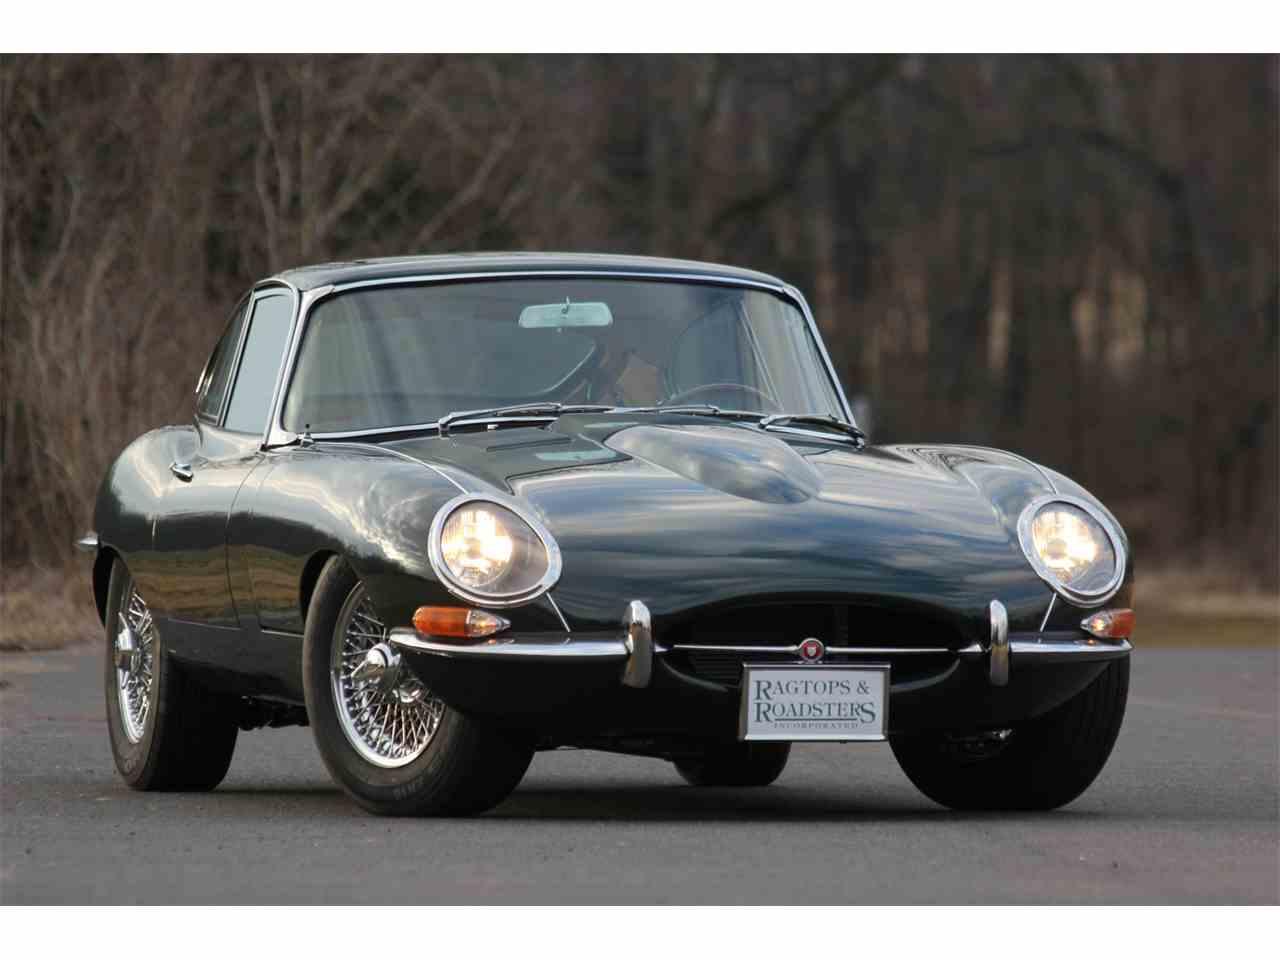 1963 Jaguar E-Type for Sale | ClassicCars.com | CC-988059